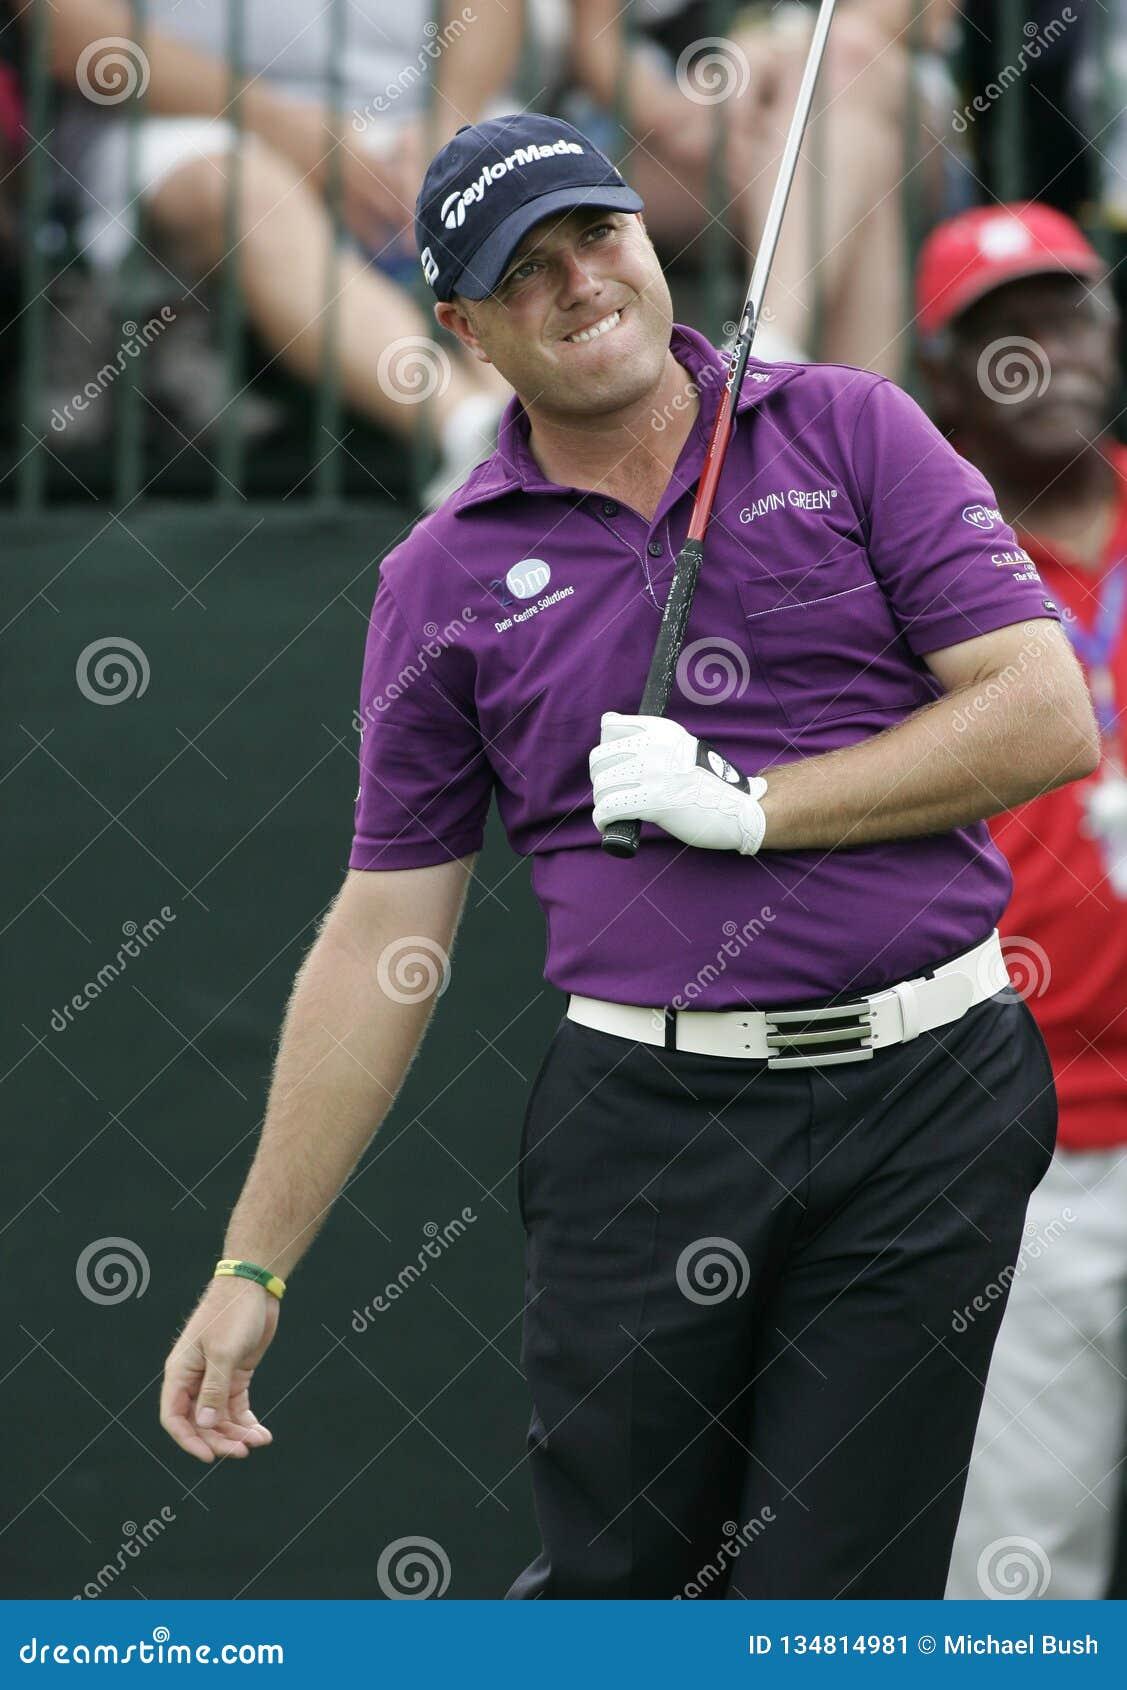 2008 championnats de golf du monde - championnat de CA